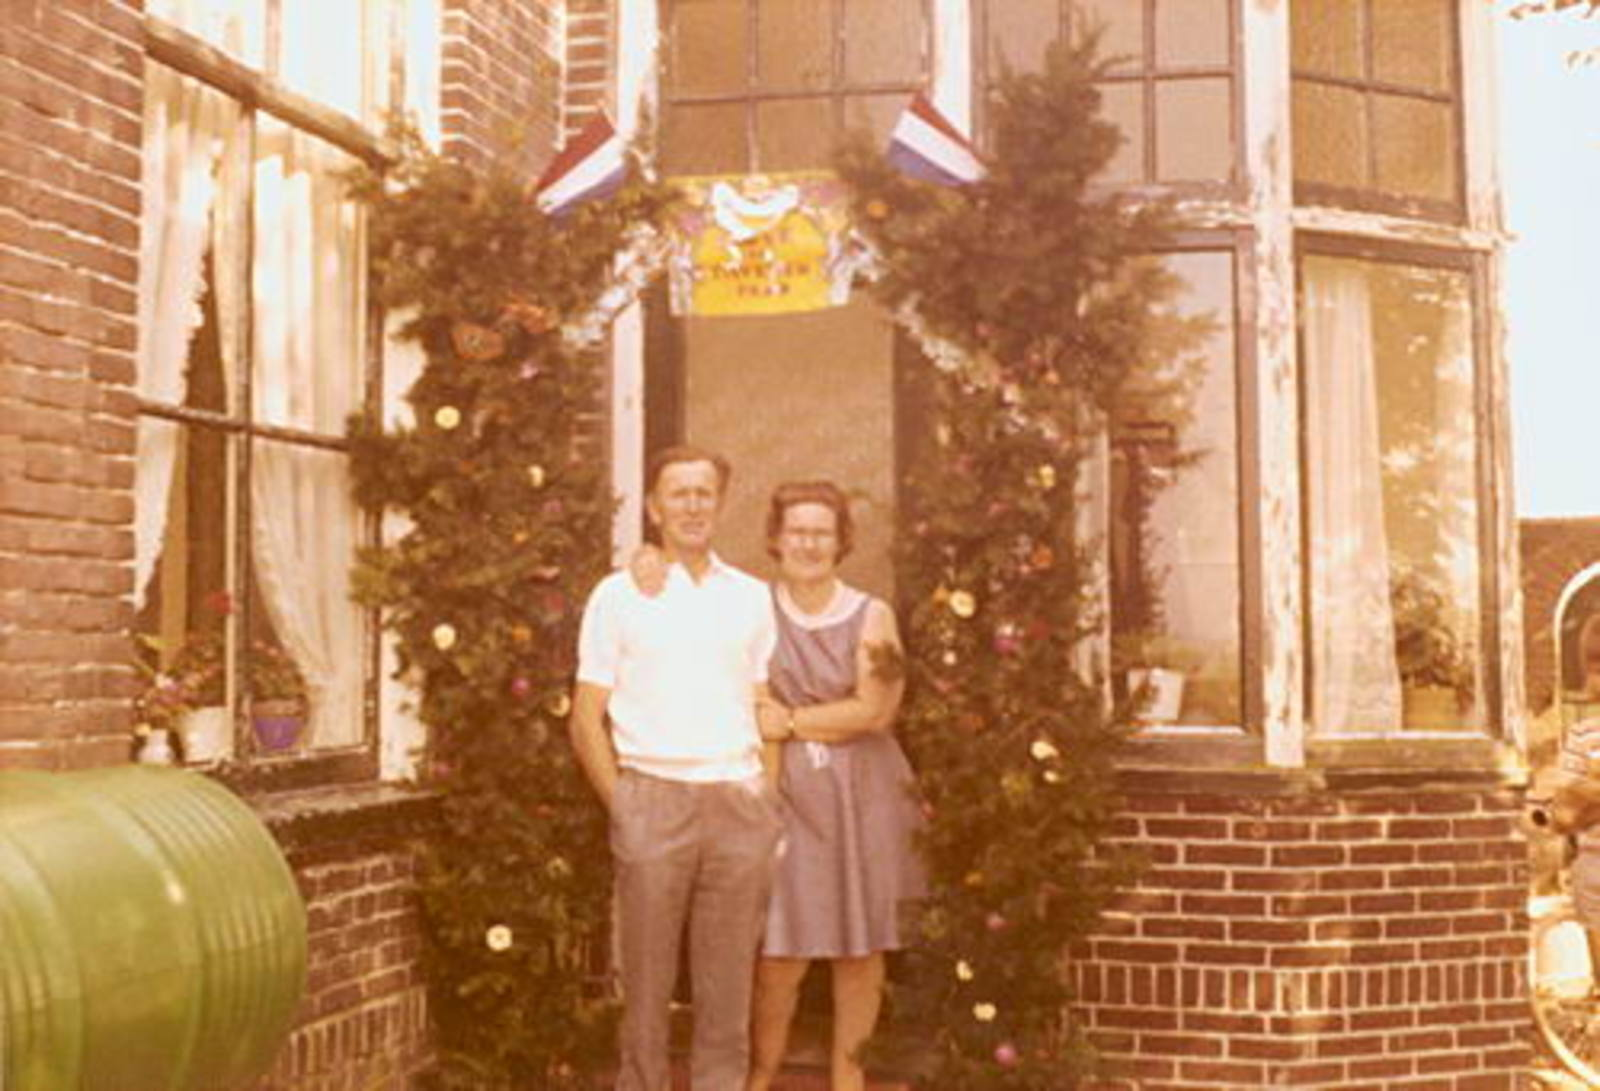 IJweg O 0910 1972 Iman C Imanse 25jr Getrouwd met Leentje Bliek 01